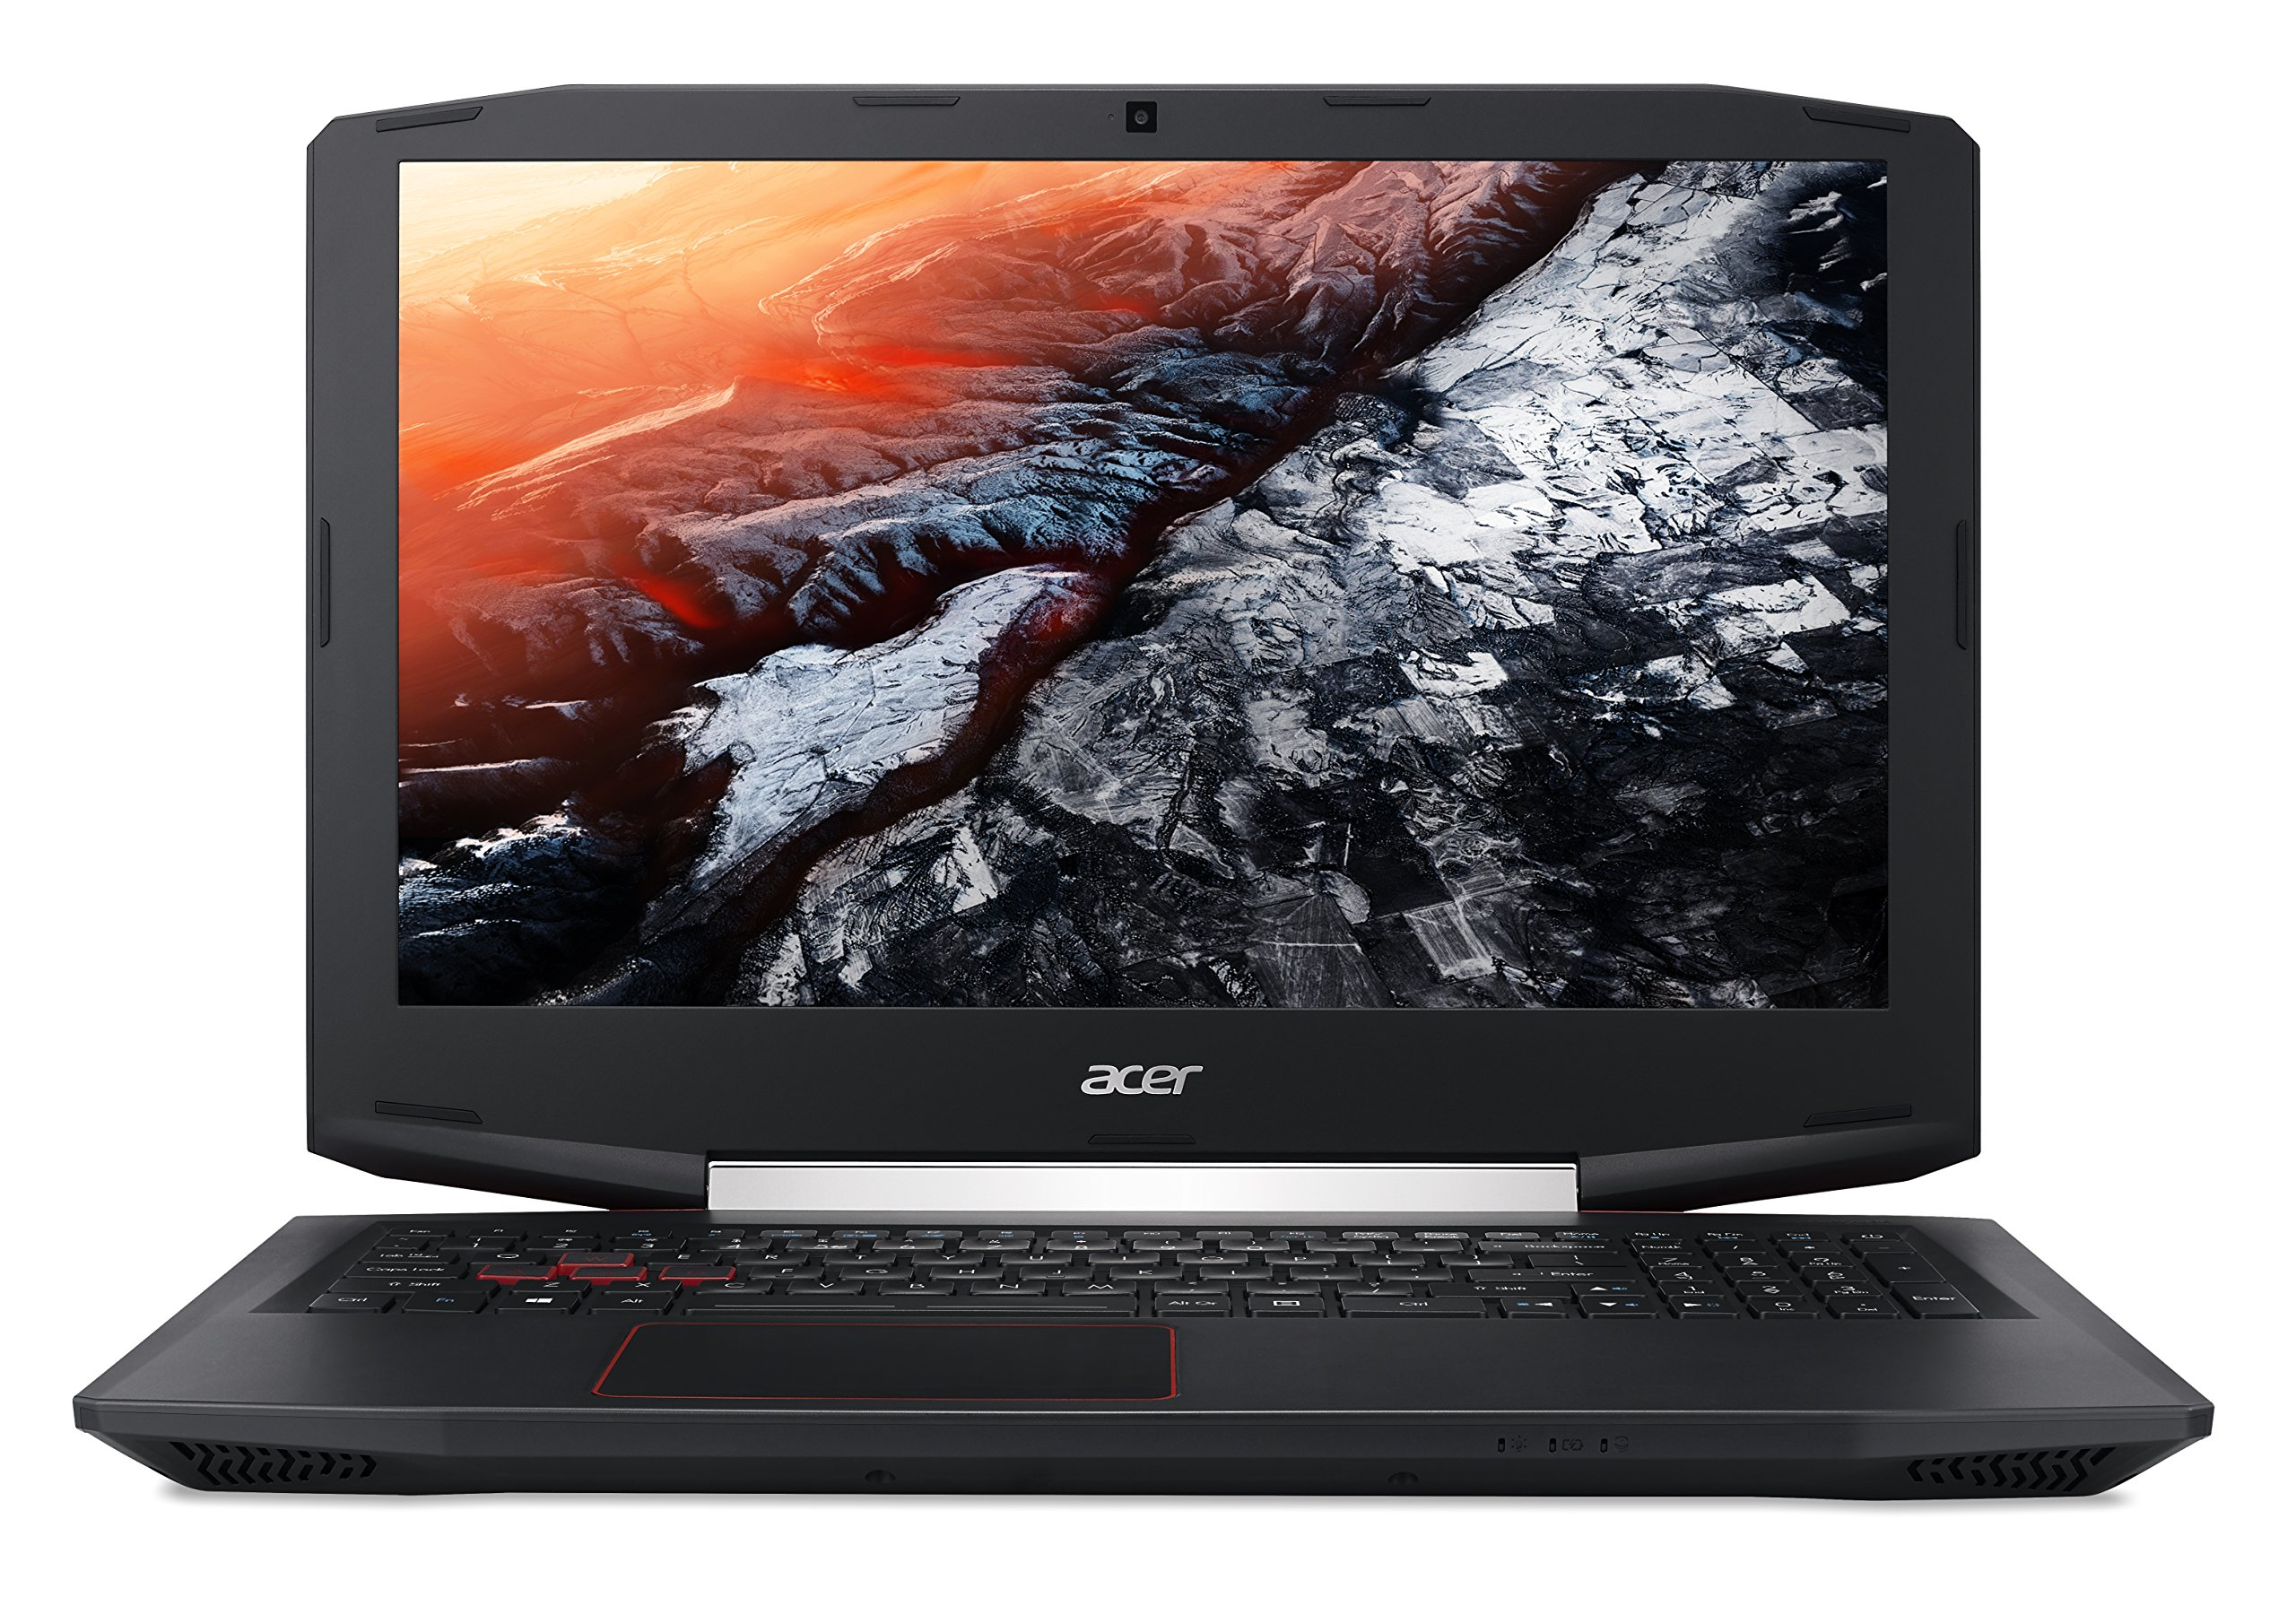 Acer Aspire VX 15 Gaming Laptop, 7th Gen Intel Core i7, NVIDIA GeForce GTX 1050 Ti, 15.6 Full HD, 16GB DDR4, 256GB SSD, VX5-591G-75RM by Acer (Image #1)